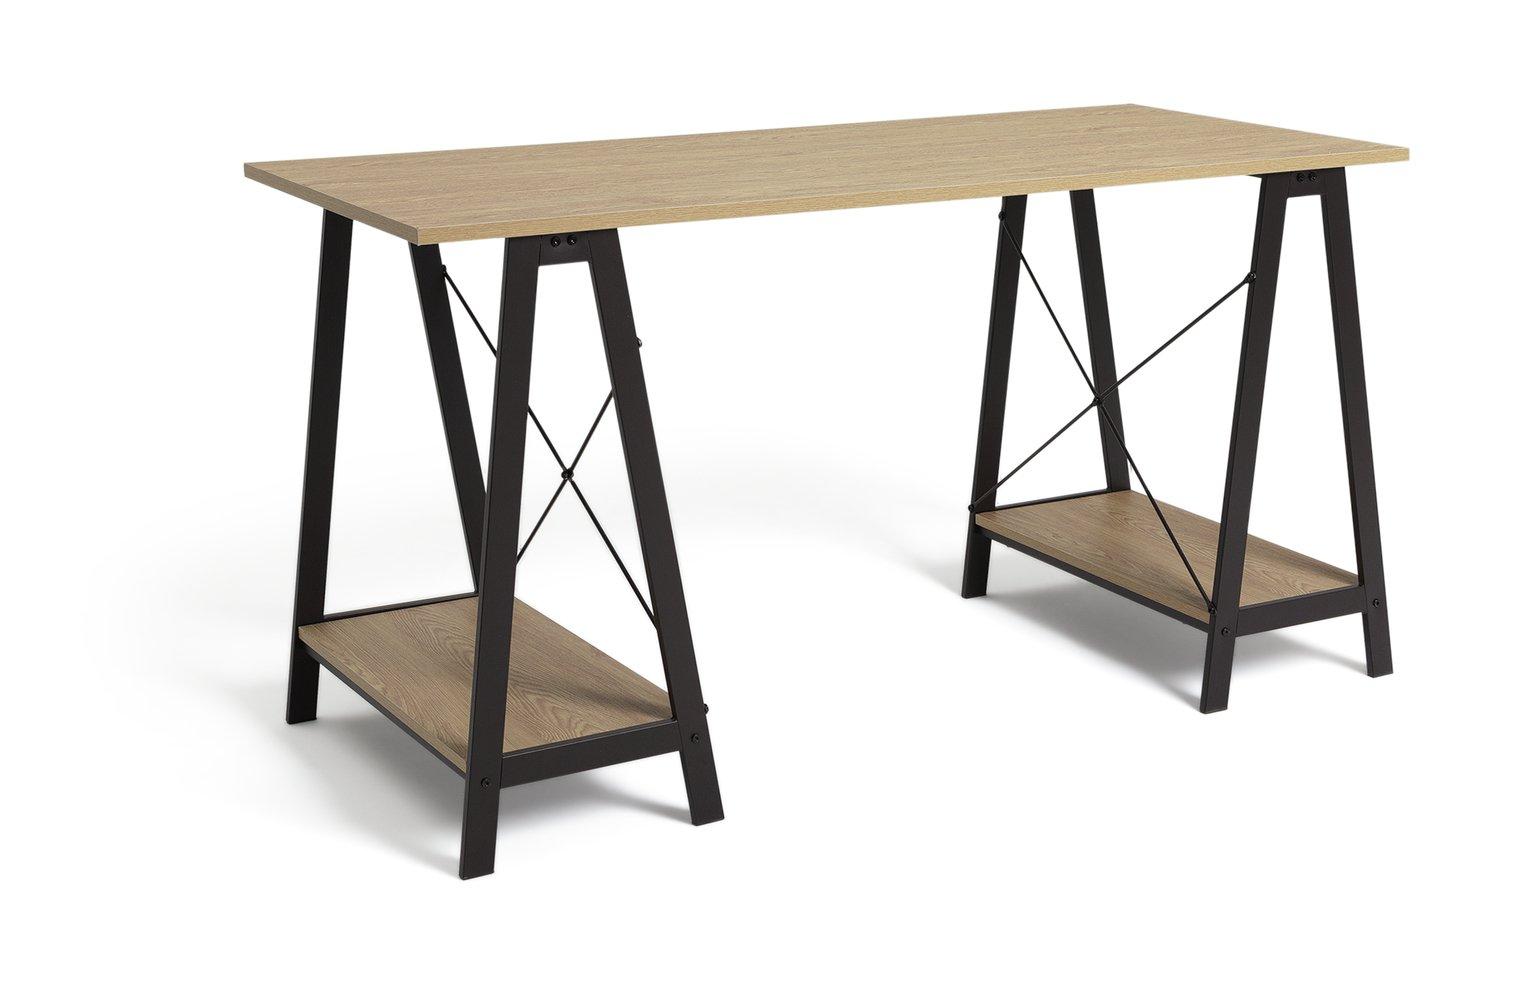 buy home large trestle table desk at argos.co.uk - your online shop